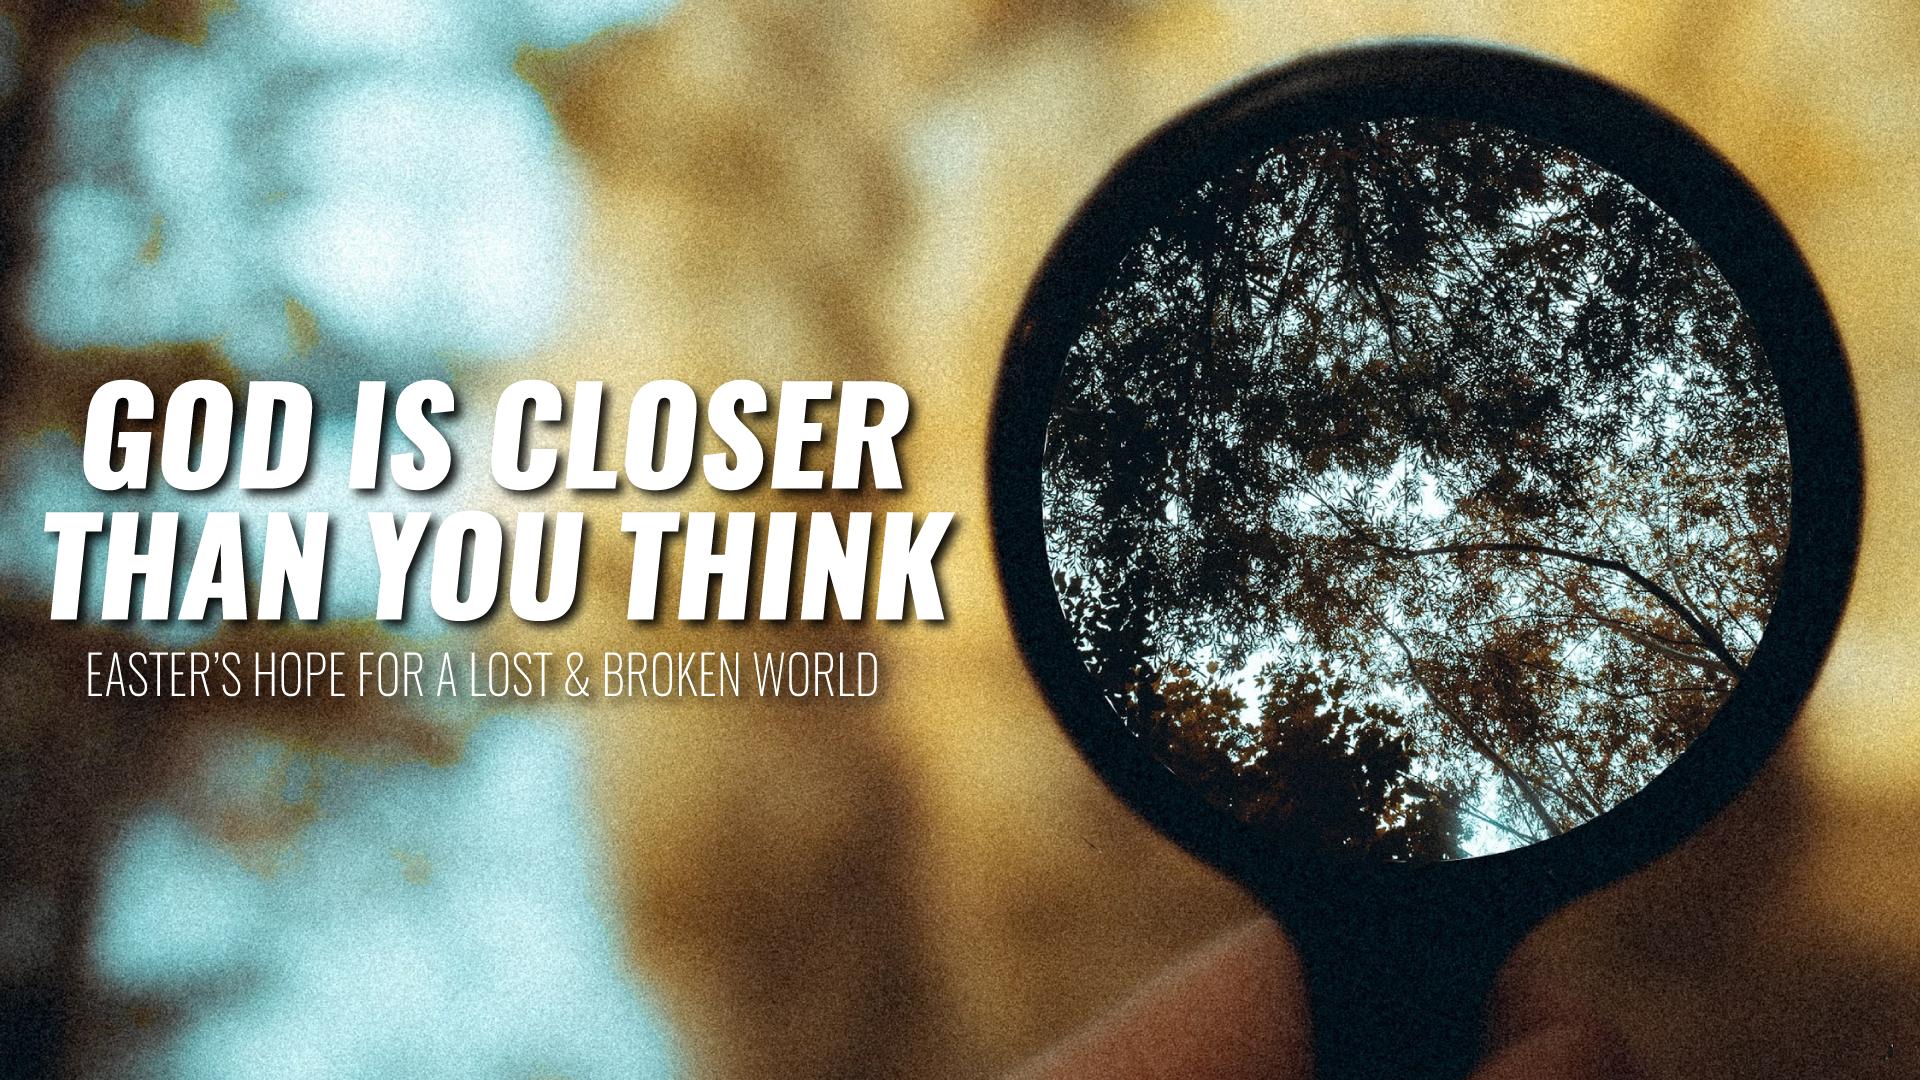 God-is-Closer-1920x1080